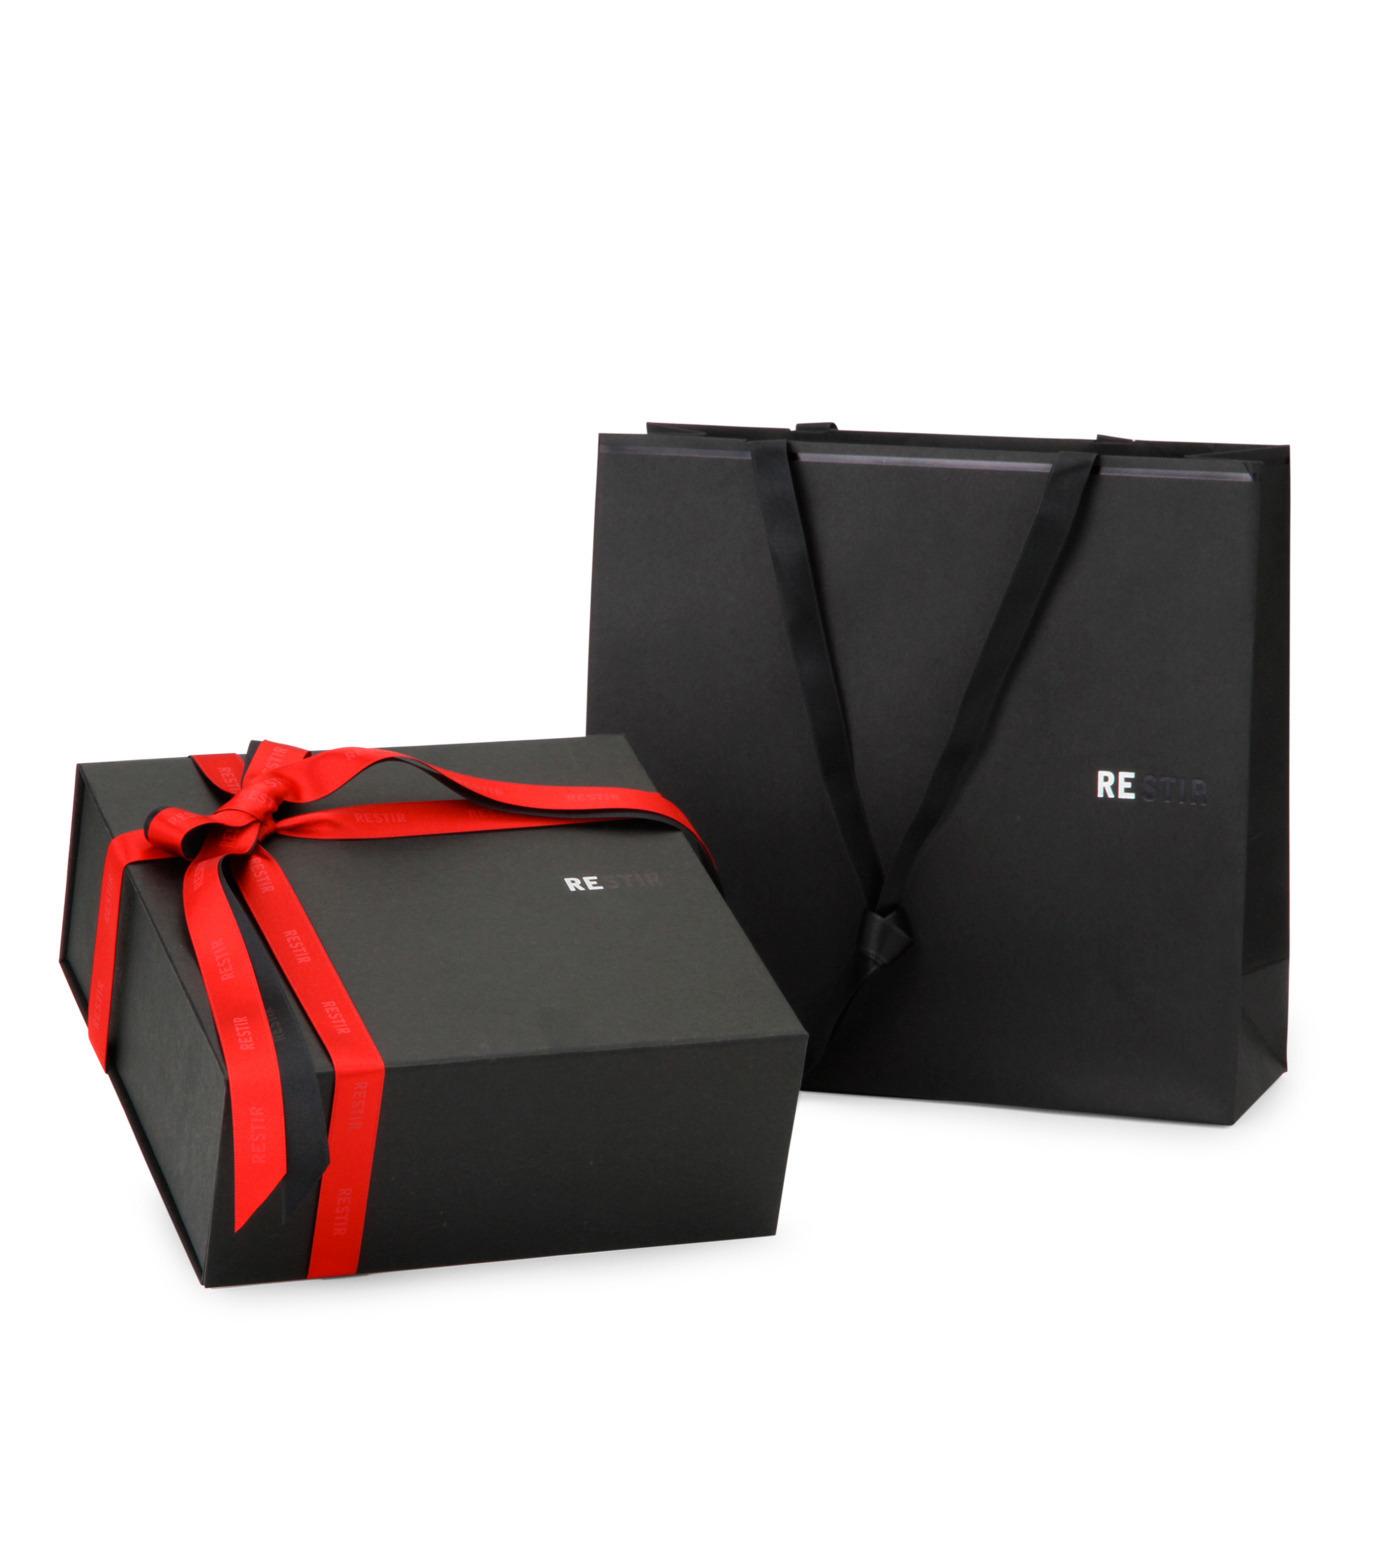 Gift Set(ギフトセット)のNail kit-NONE-Giftset-nai2-0 拡大詳細画像5